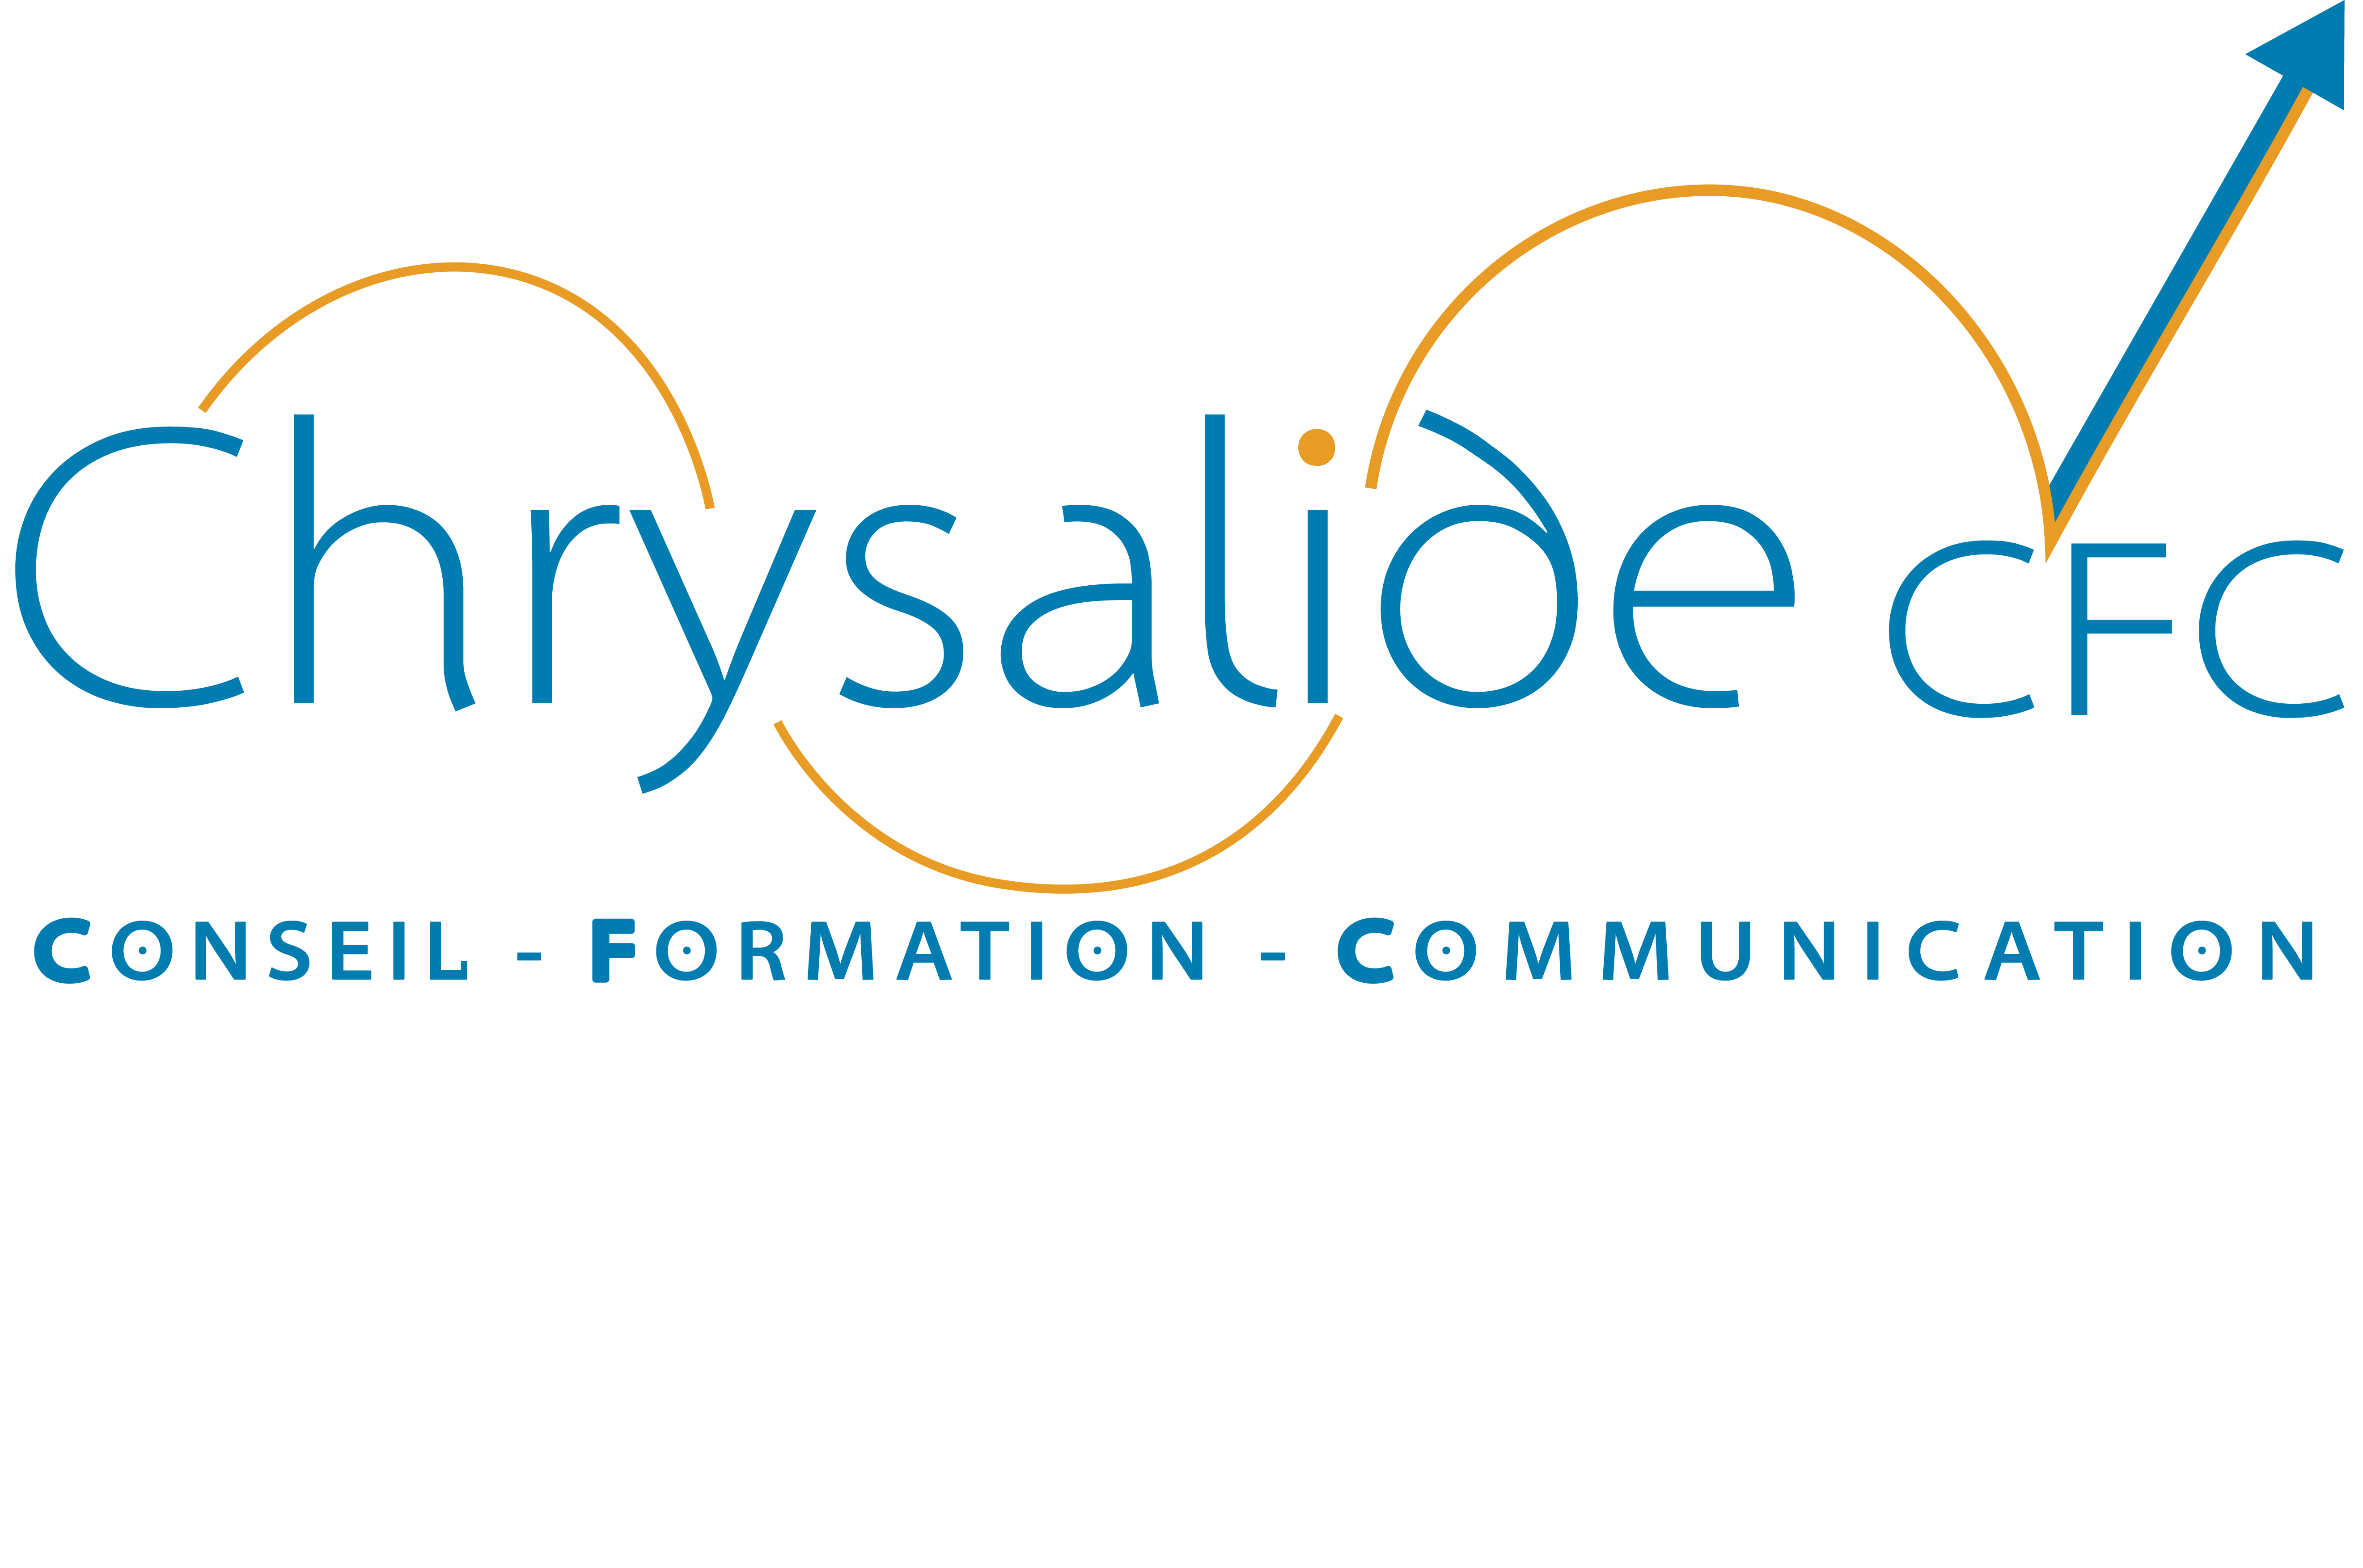 Chrysalide CFC